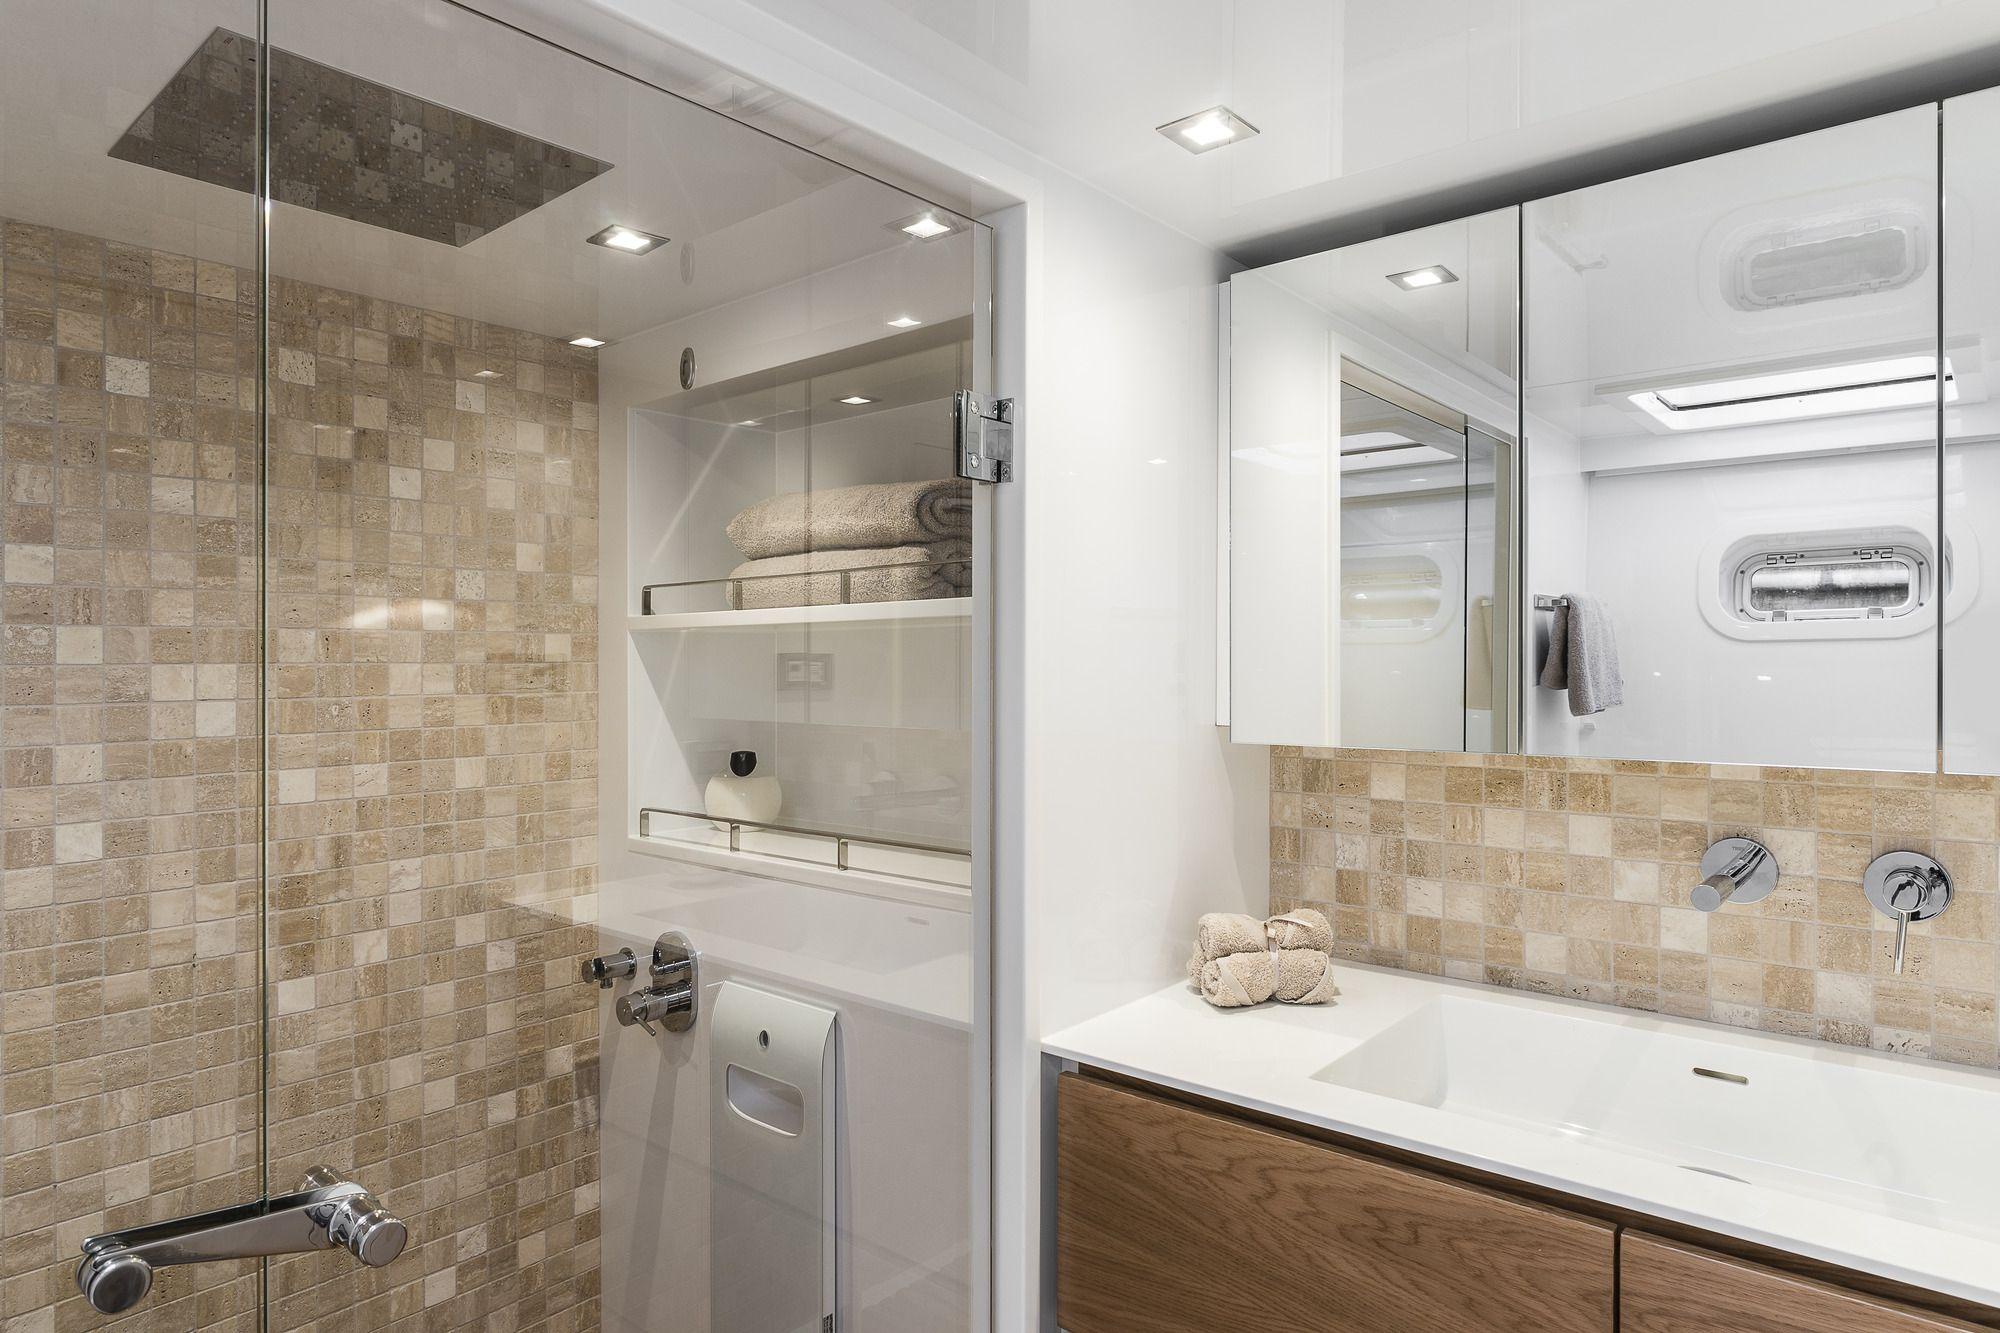 ADEA Sunreef 60 Luxury Catamaran Contemporary Shower